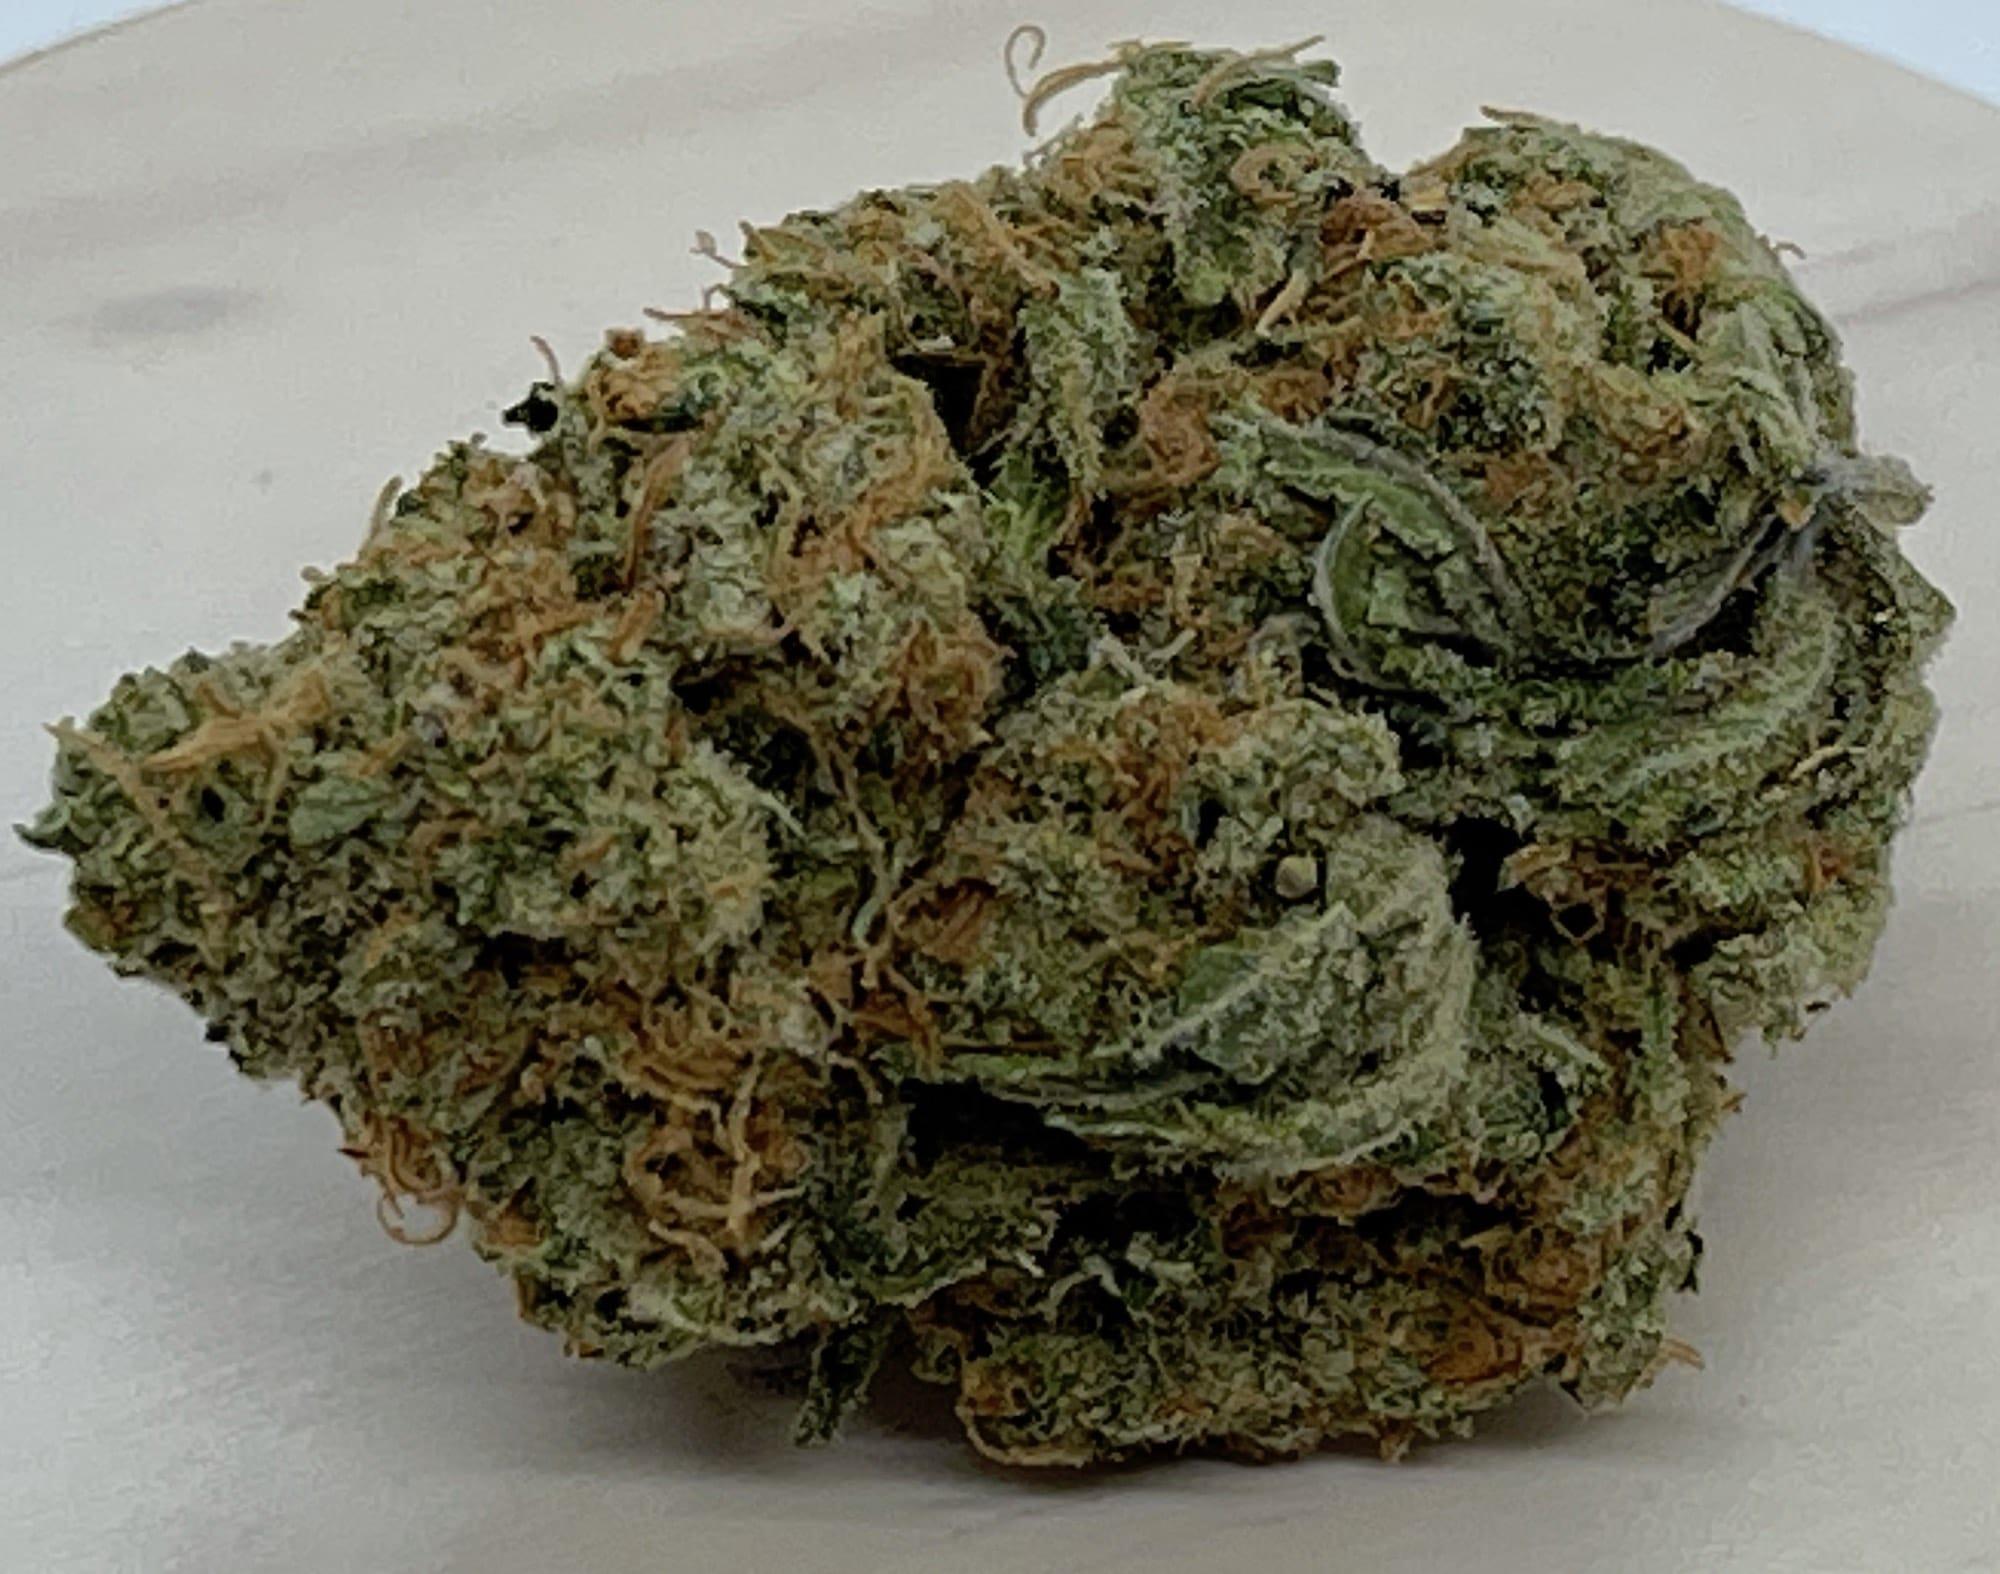 athenas gifts dc jack herer weed photo